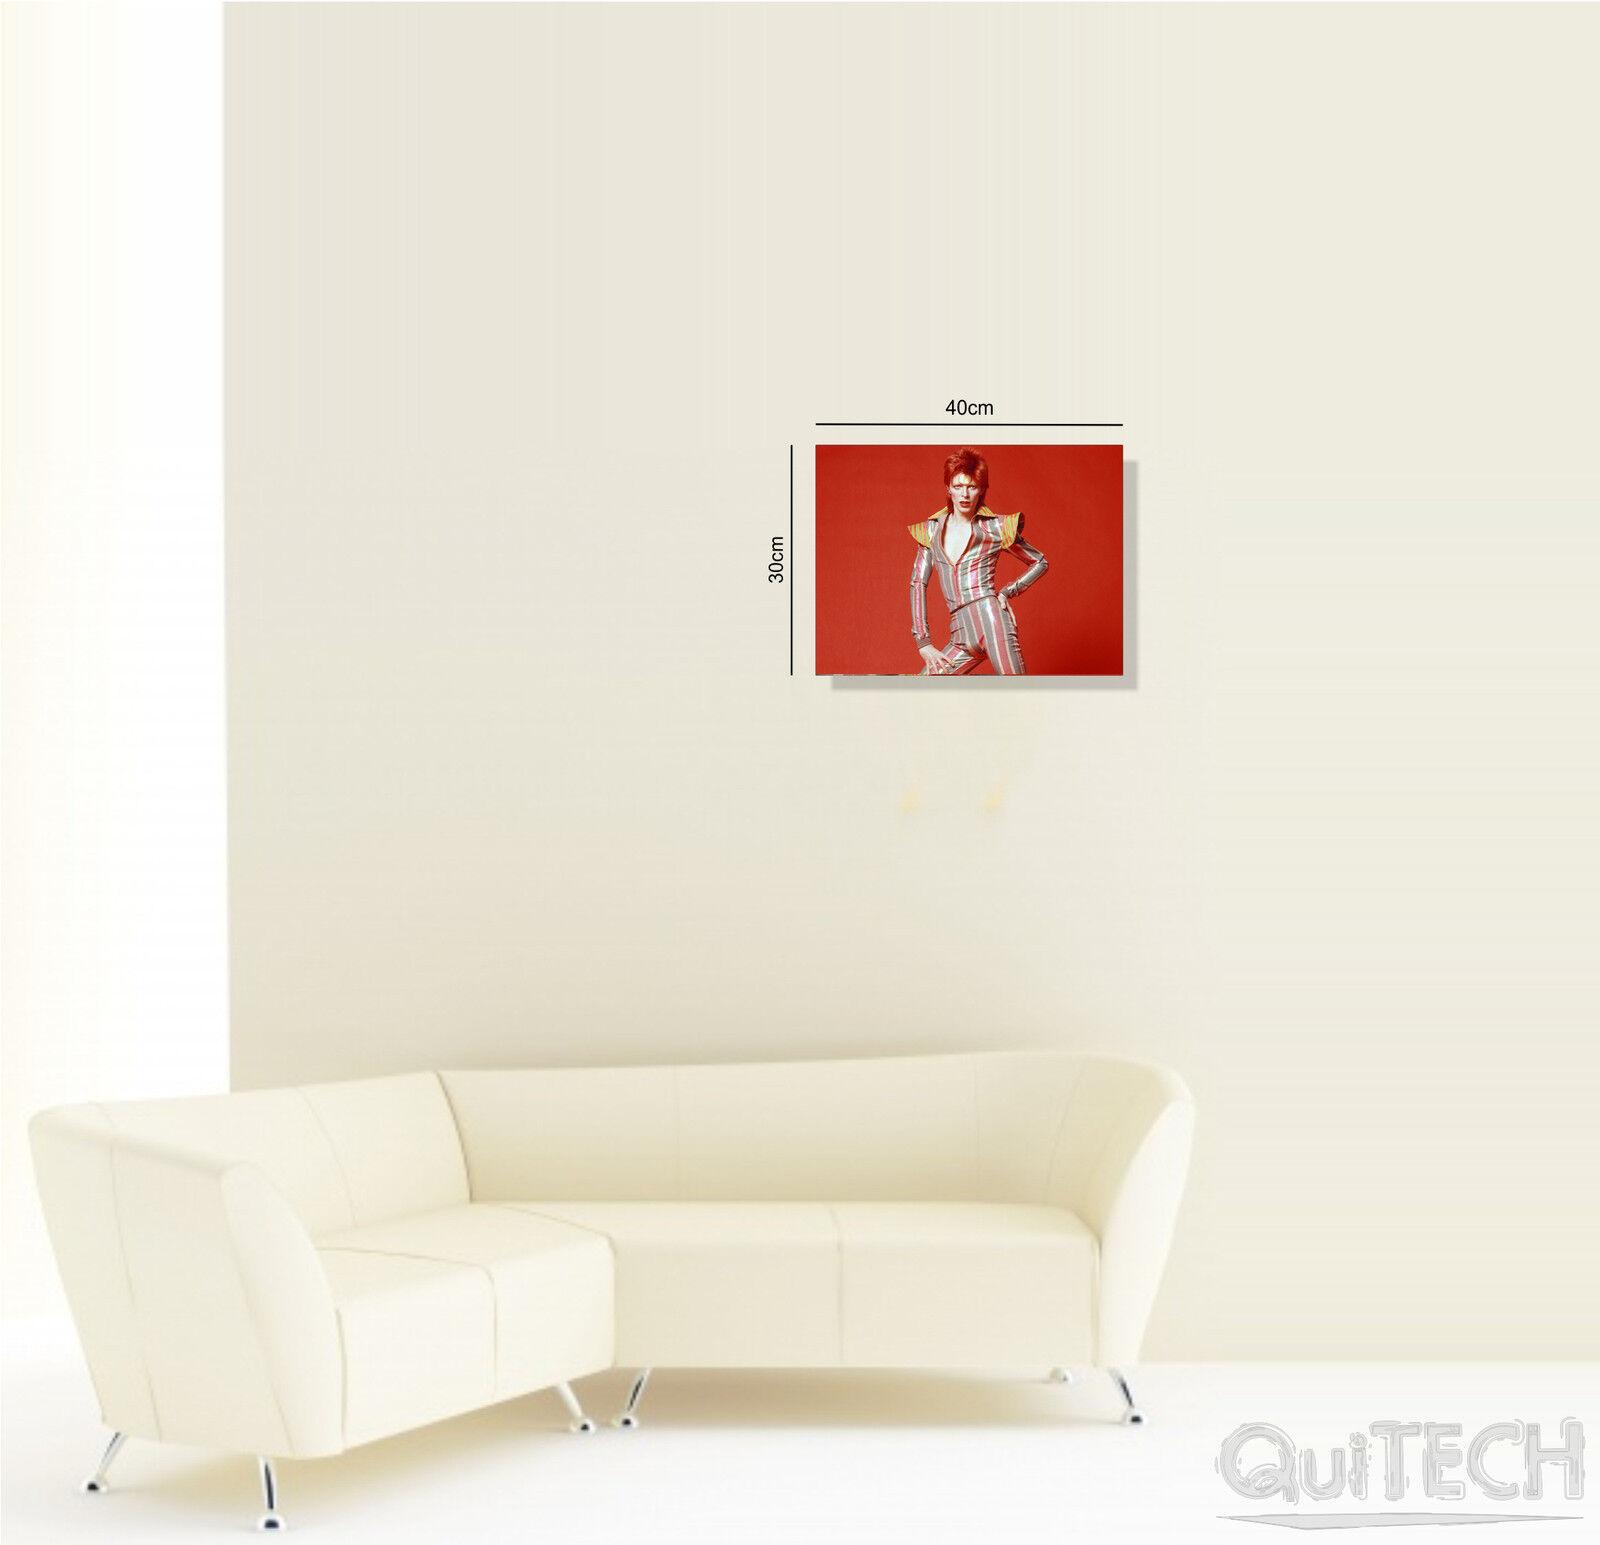 David Bowie - 13 Dipinto - Quadro stampa su Tela Pelle Canvas Dipinto 13 Arte Moderna 034048